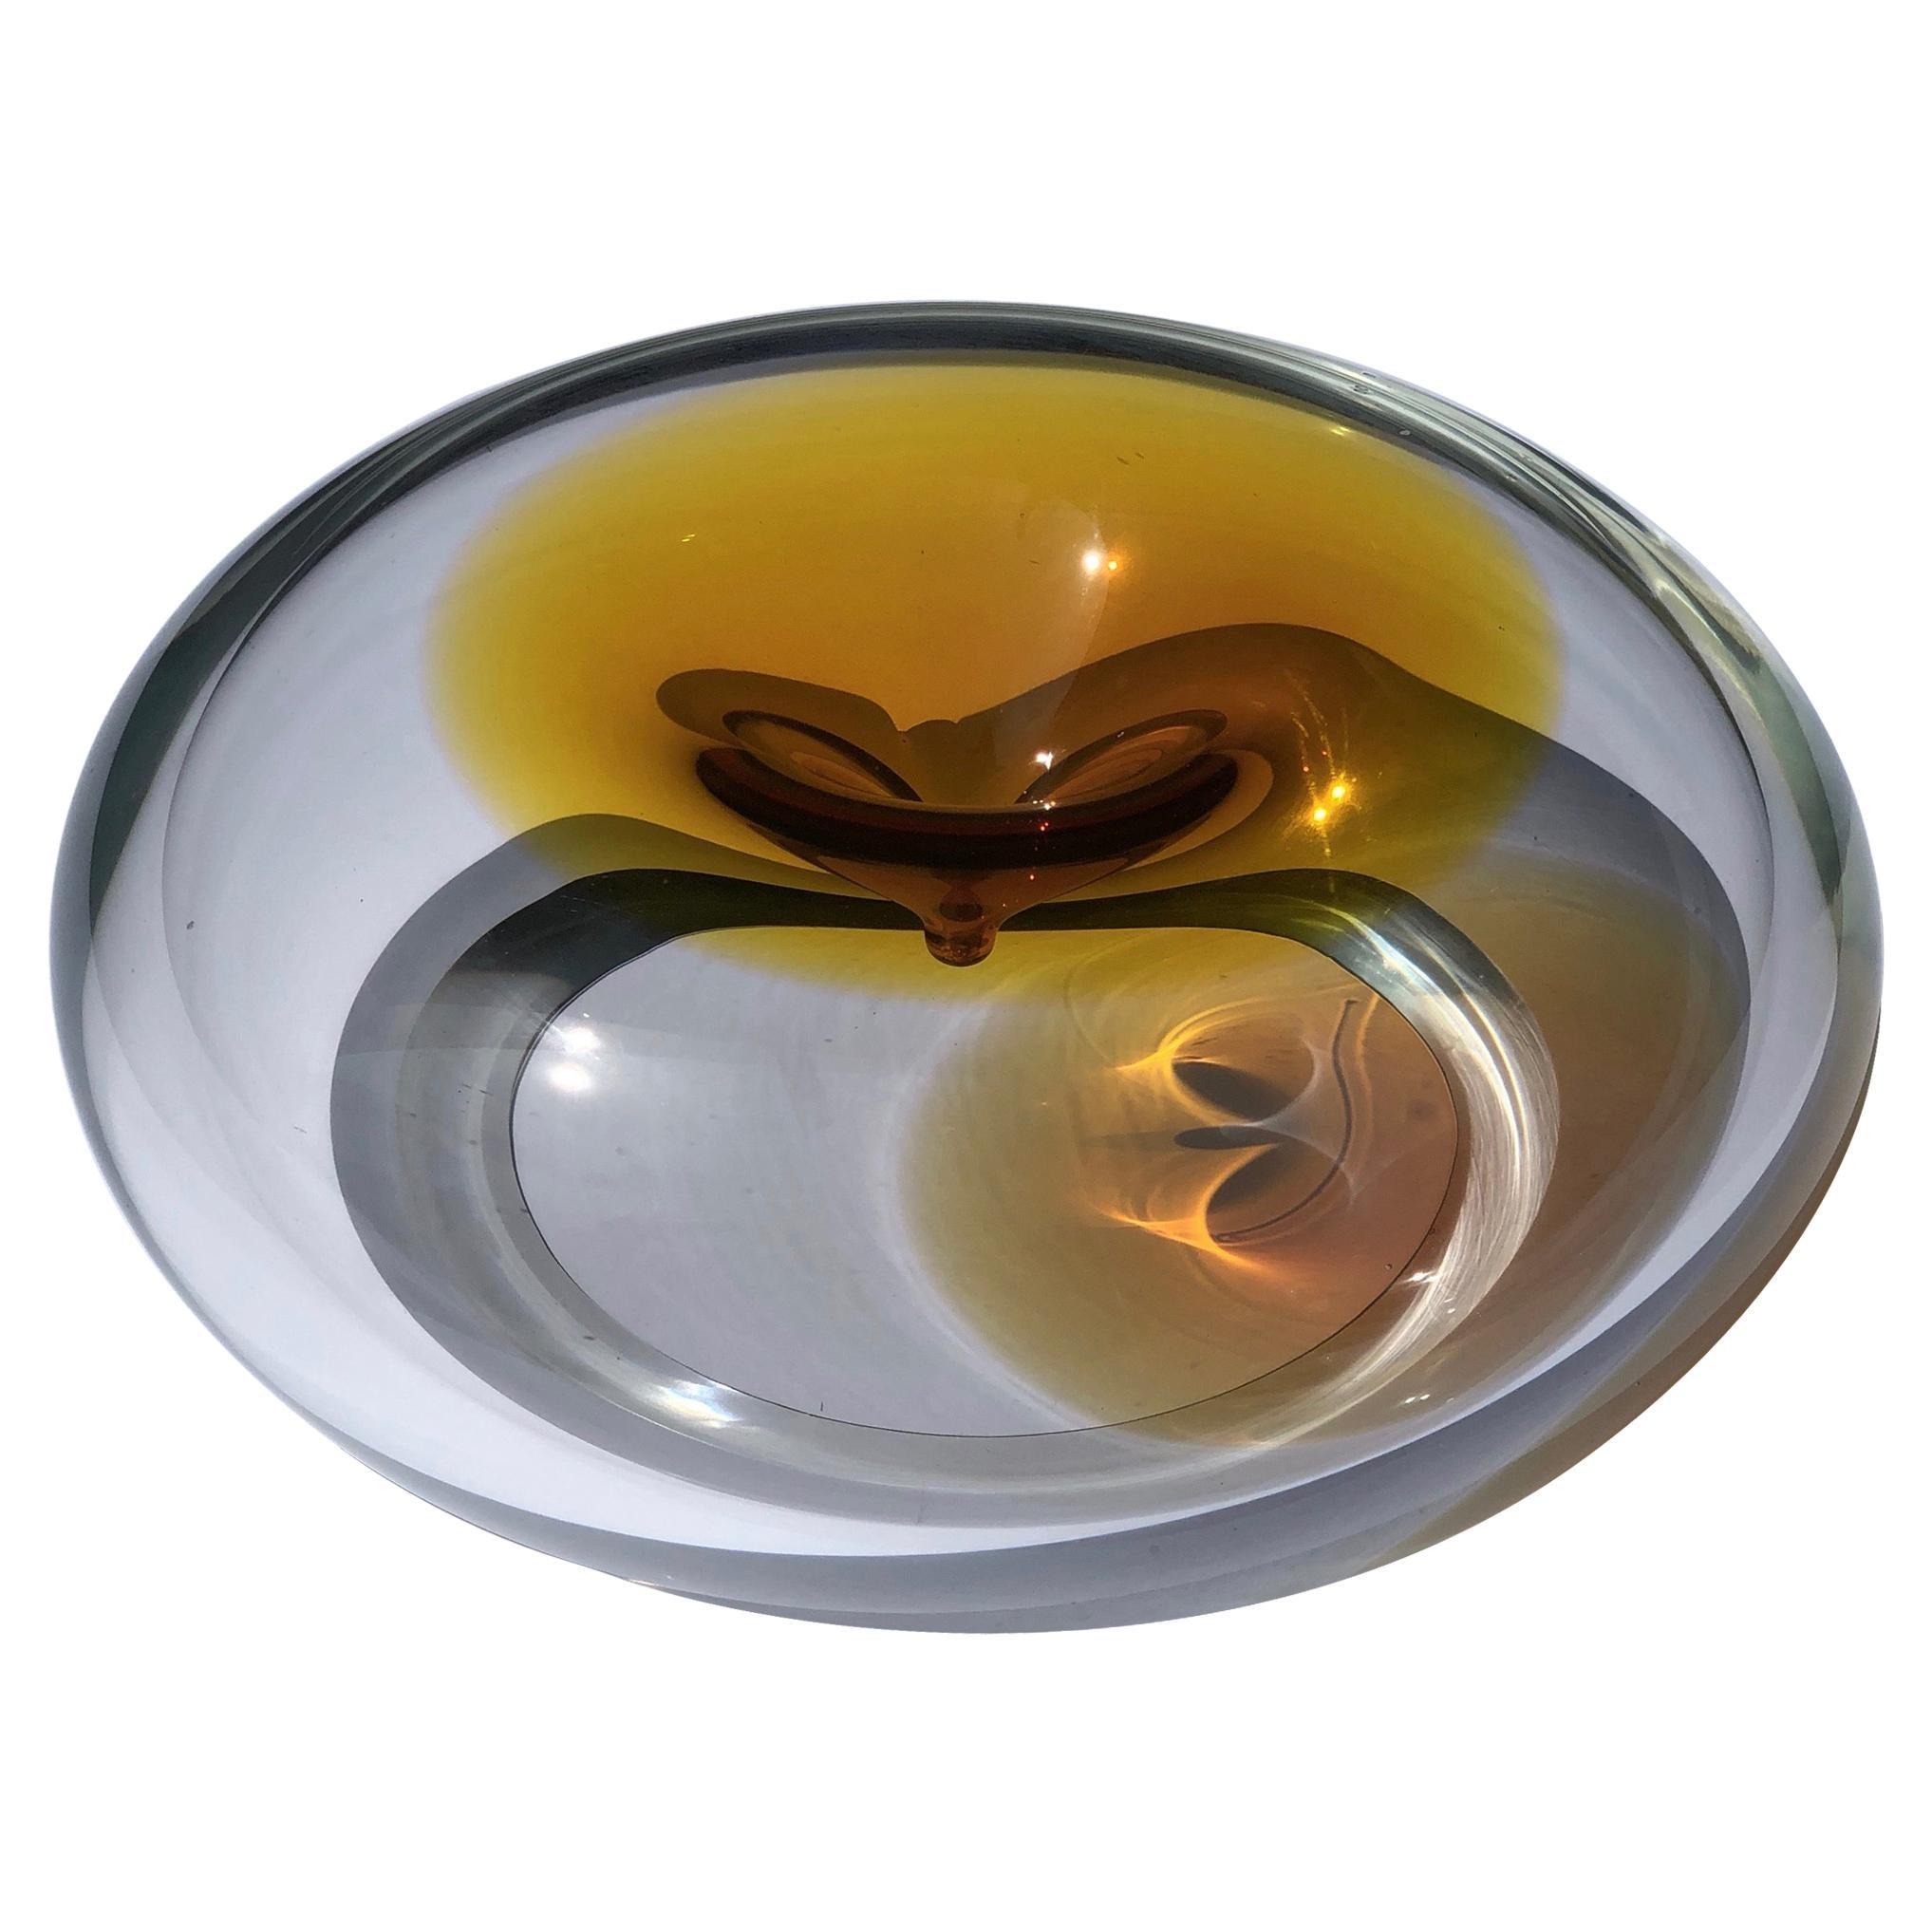 Contemporary Studio Glass, Czech Republic, The Dimple Vase